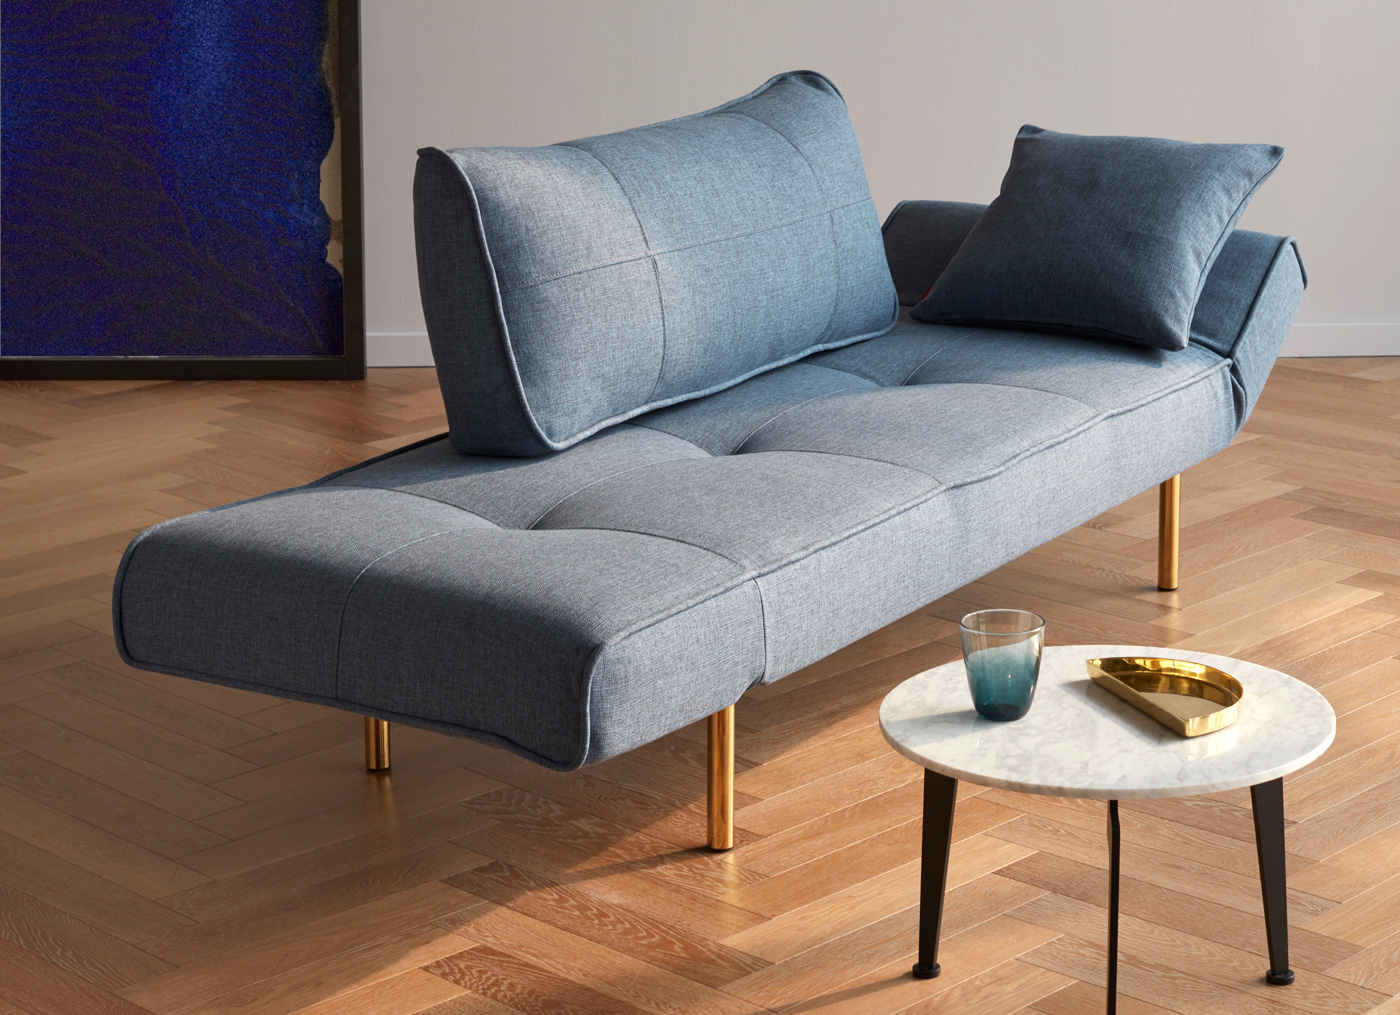 Lucerne Sleeper Sofa in Mixed Dance Light Blue with Brass Legs